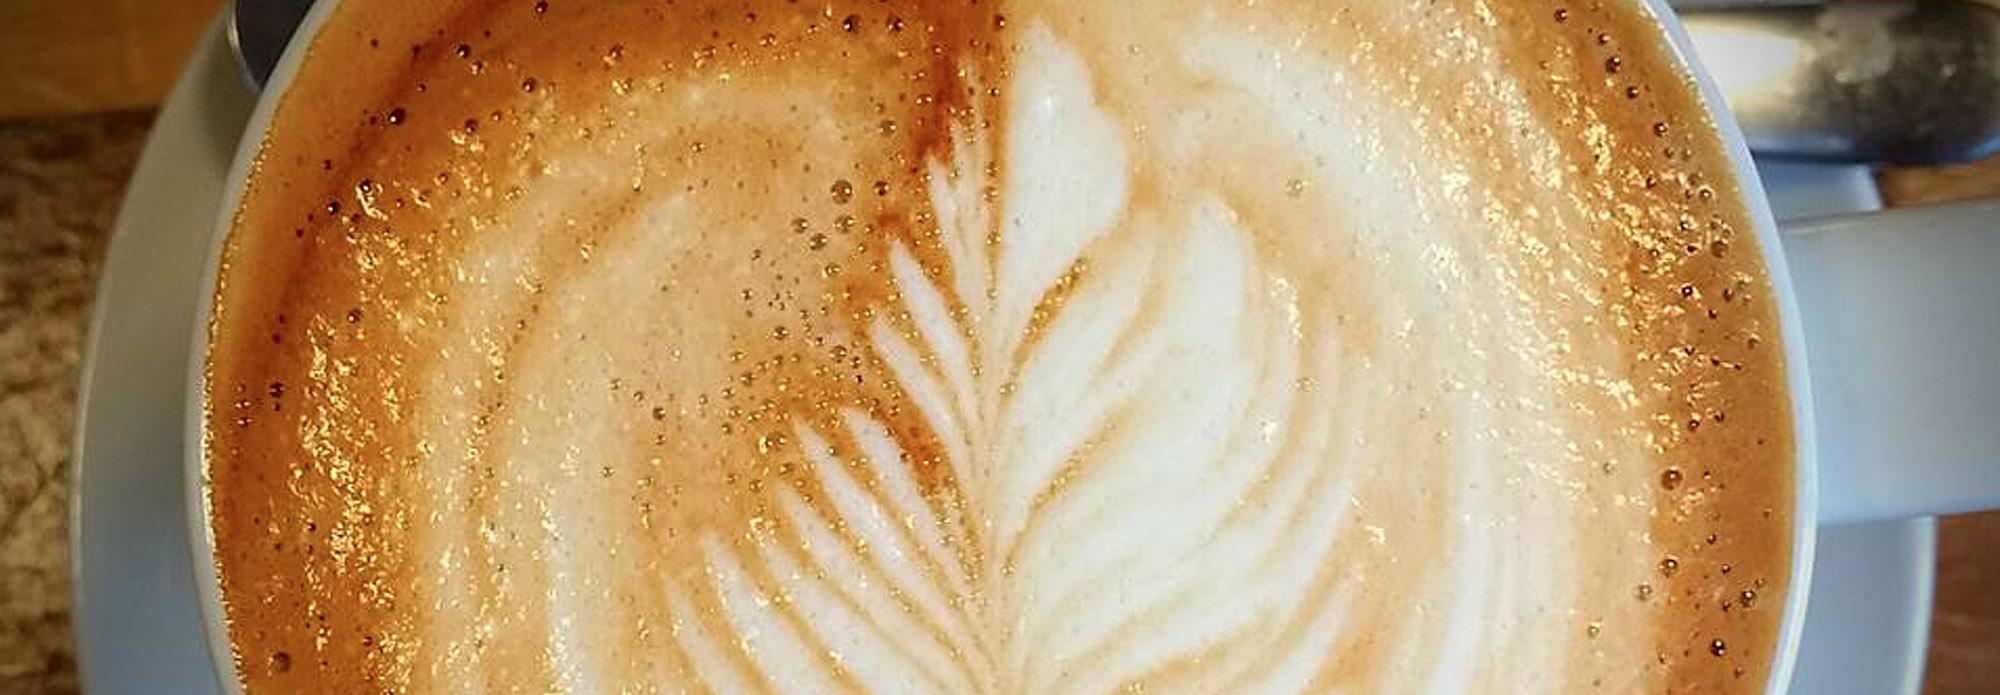 Coffee-Shop-slide-show-1.jpg